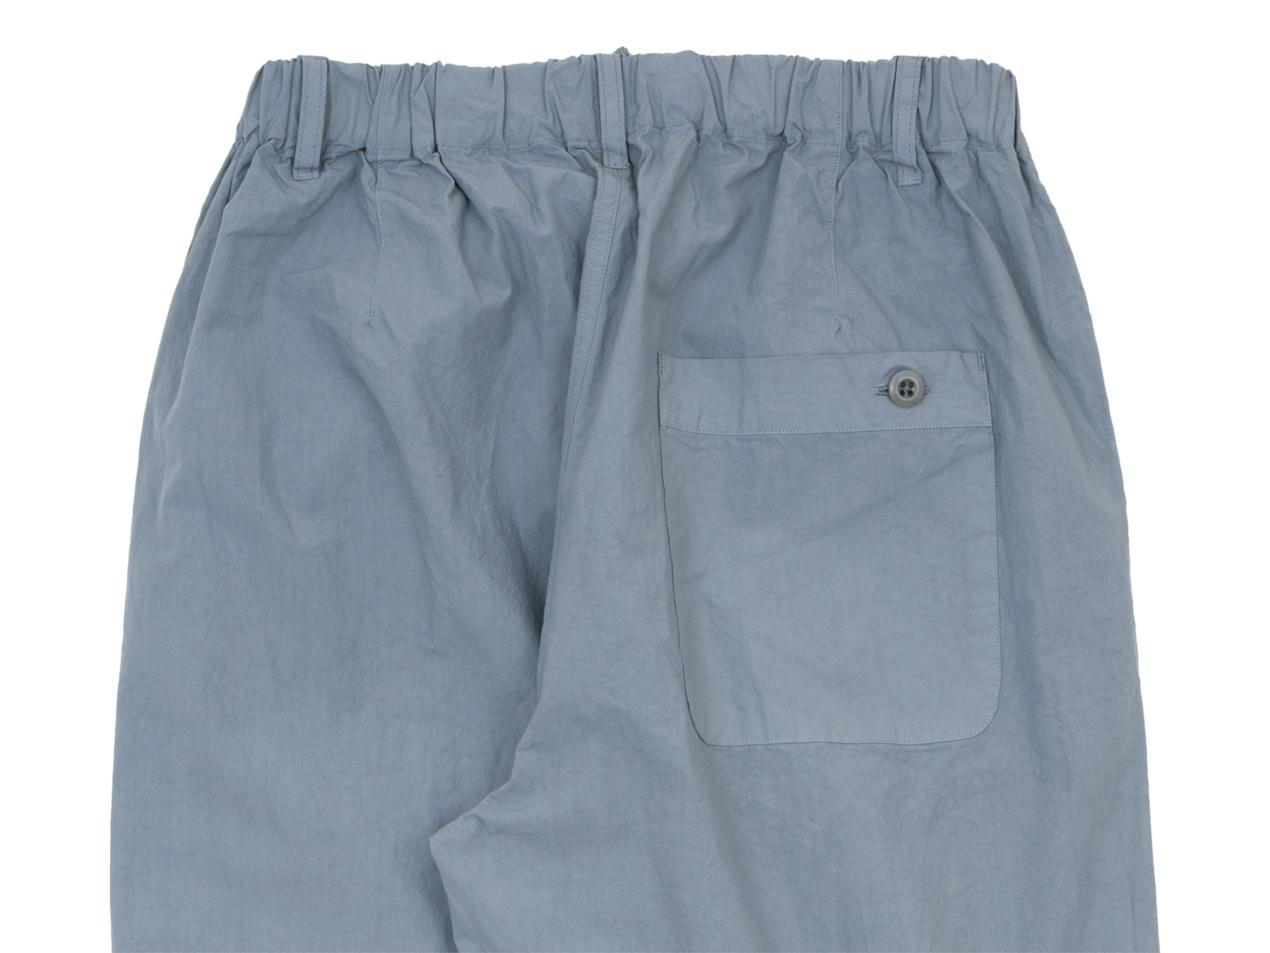 maillot mature rub cotton easy pants